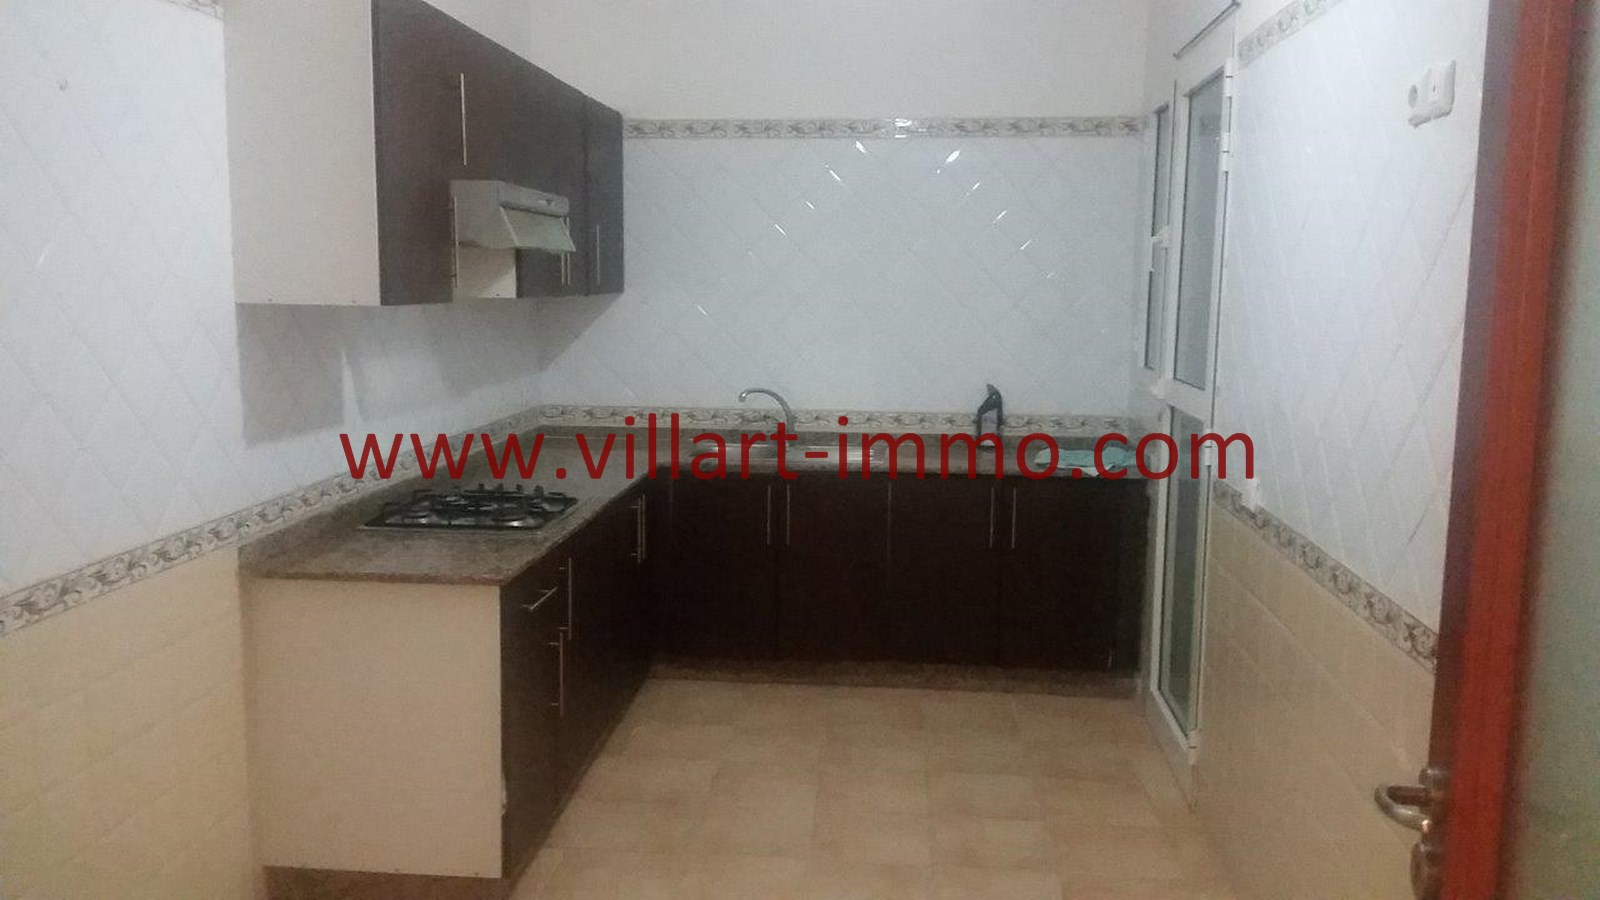 2-Location-Appartement-Non meublé-Tanger-Cuisine-L913-Villart immo